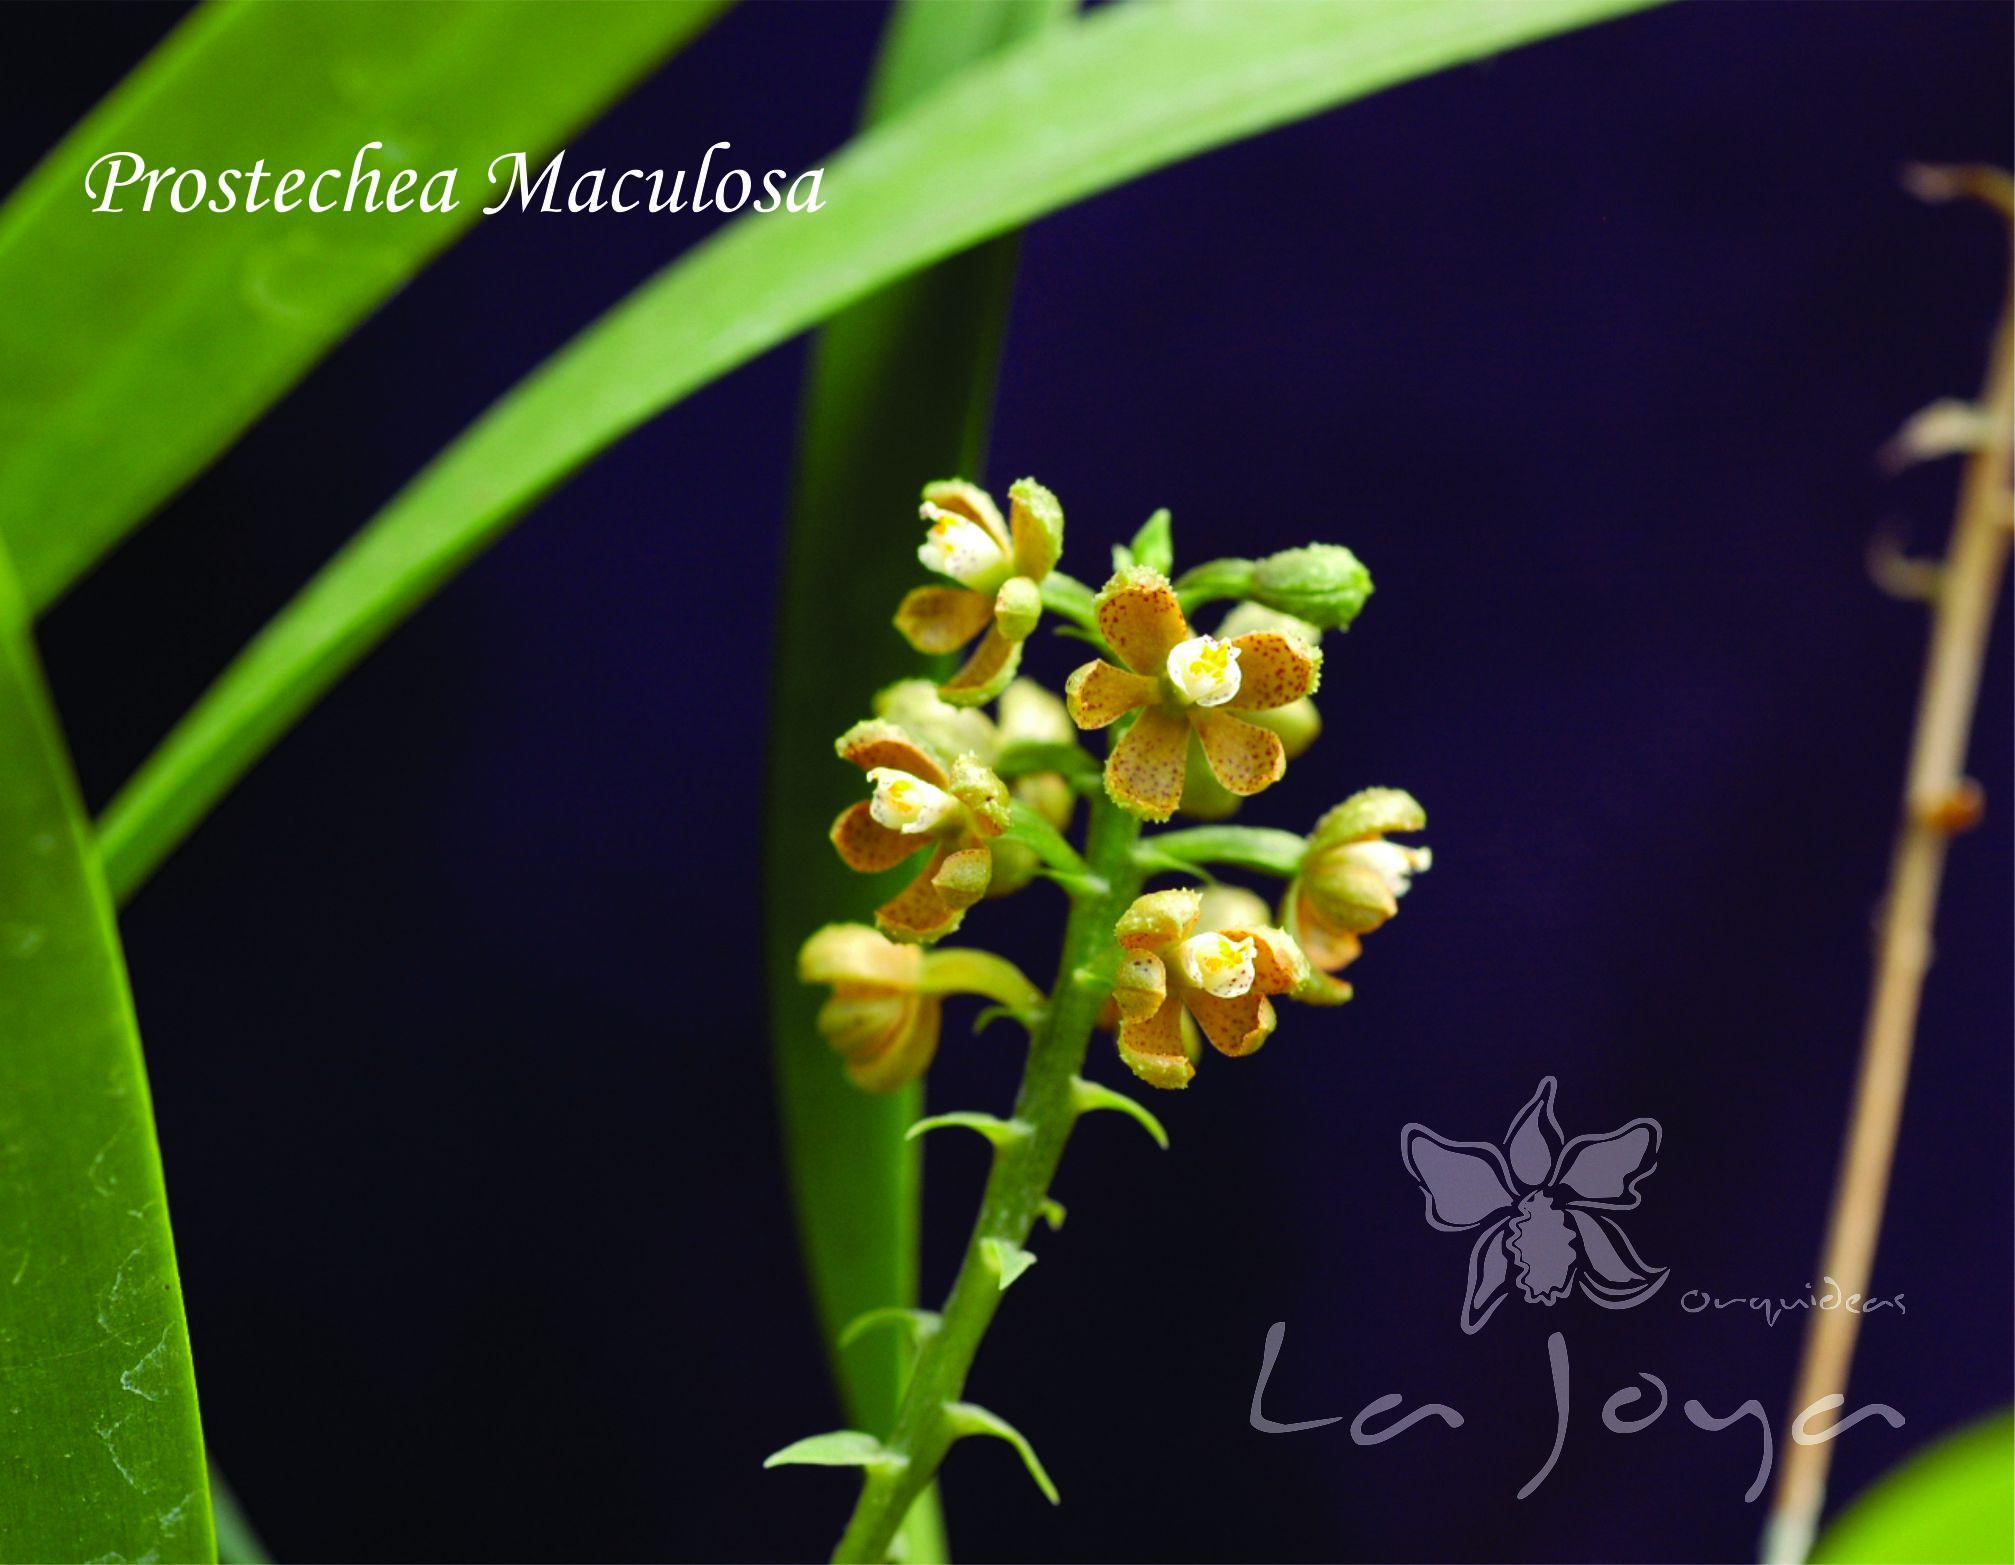 Prostechea Maculosa